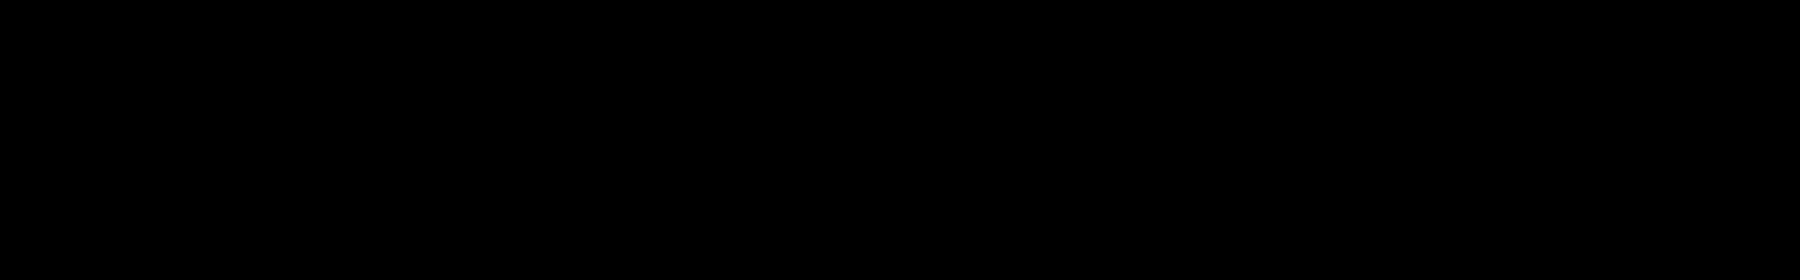 Skyline Vocal Chops Vol.2 audio waveform